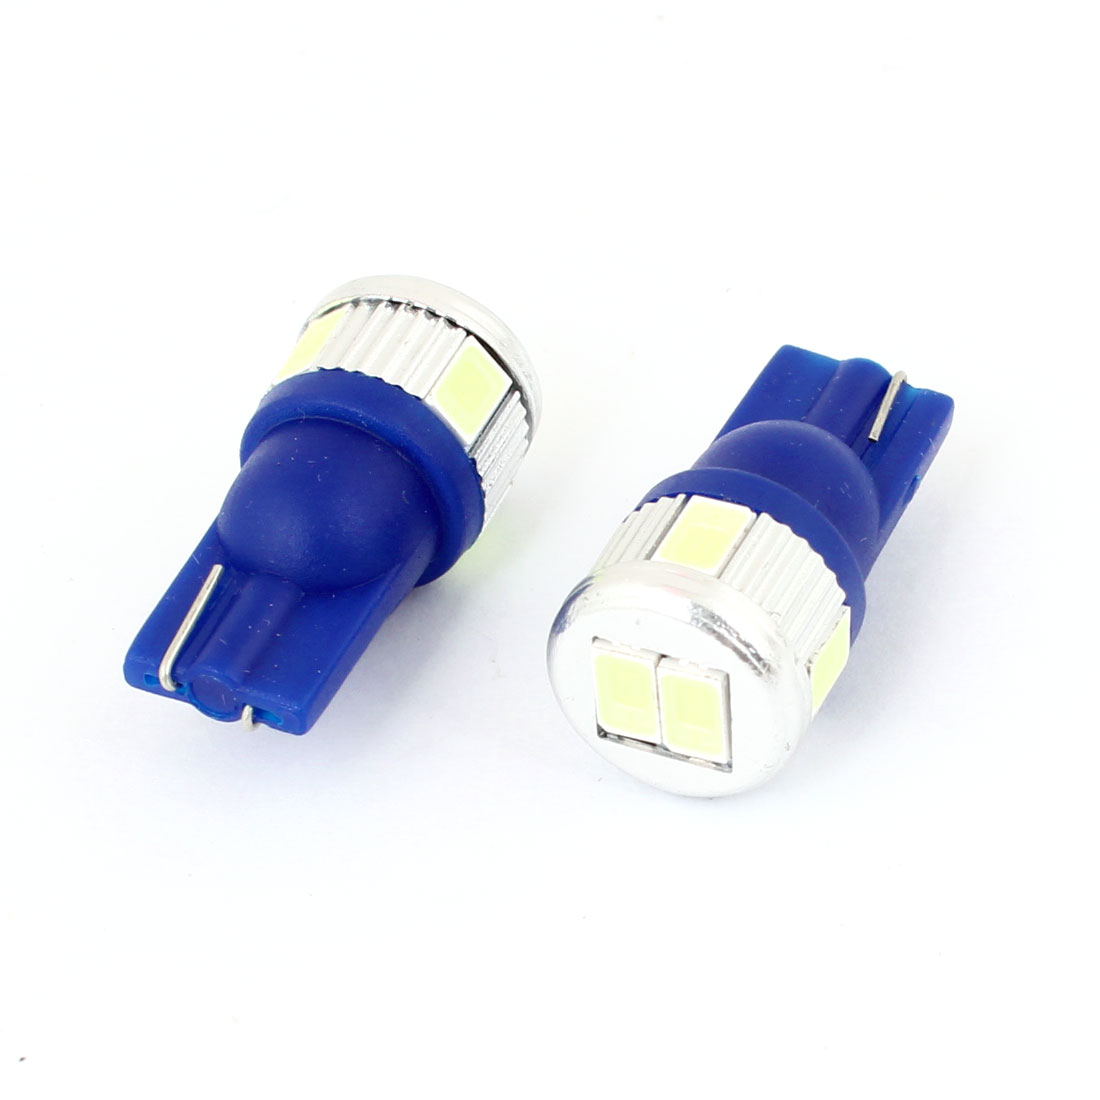 2pcs Vehicle Car 5630 SMD 6 Ice Blue LED T10 152 Turning Light Lamp Bulb